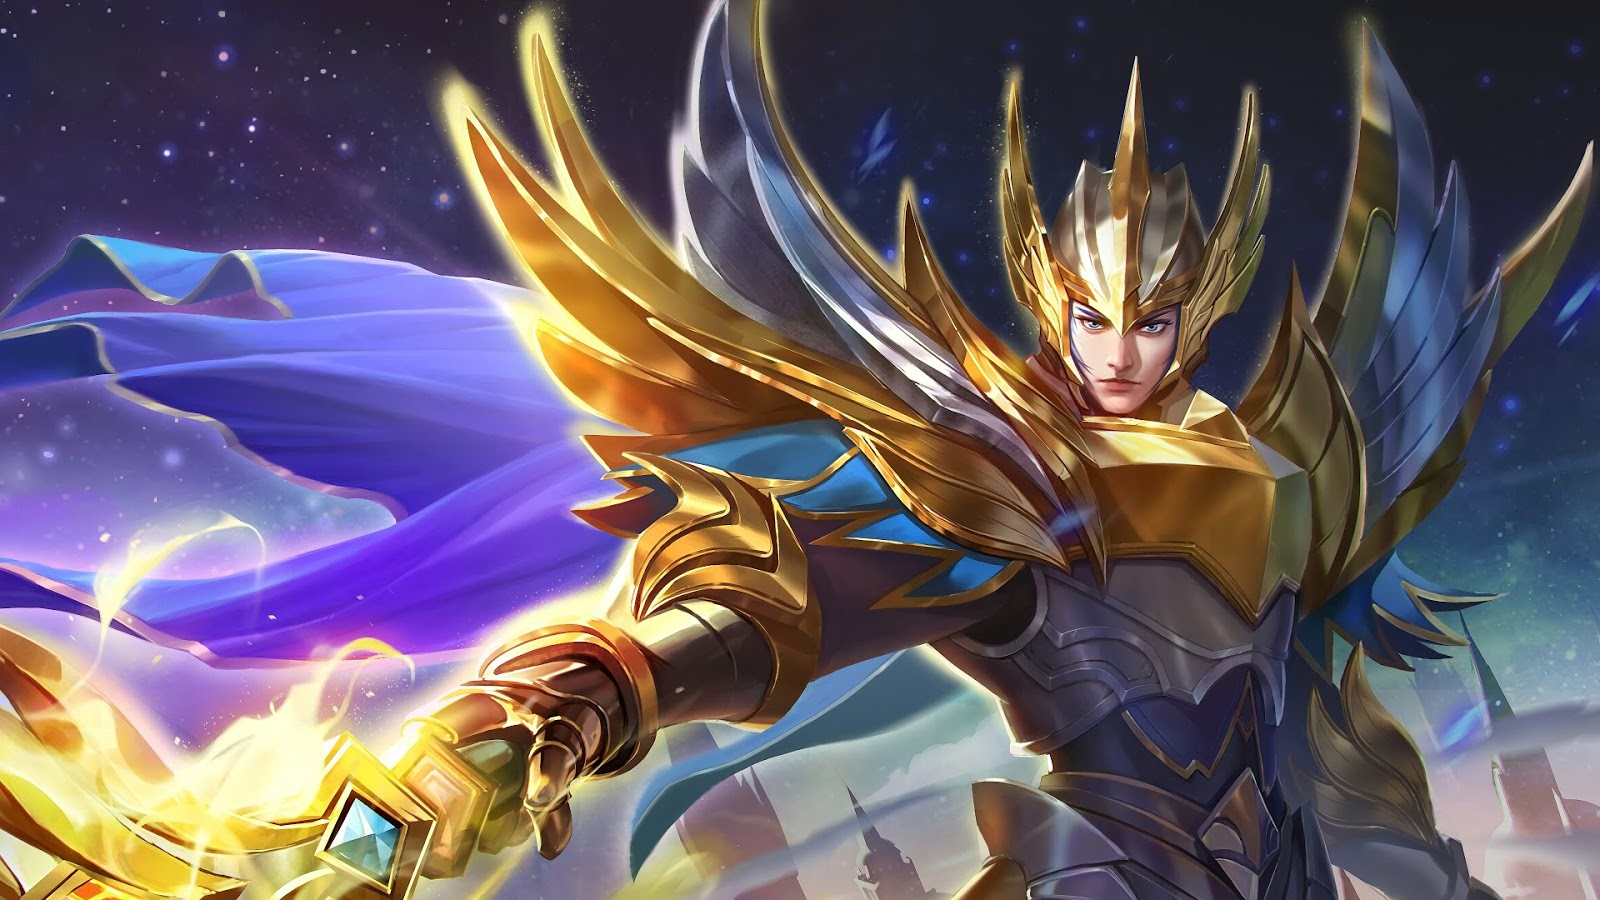 Wallpaper Zilong Glorious General Skin Mobile Legends Full HD for PC